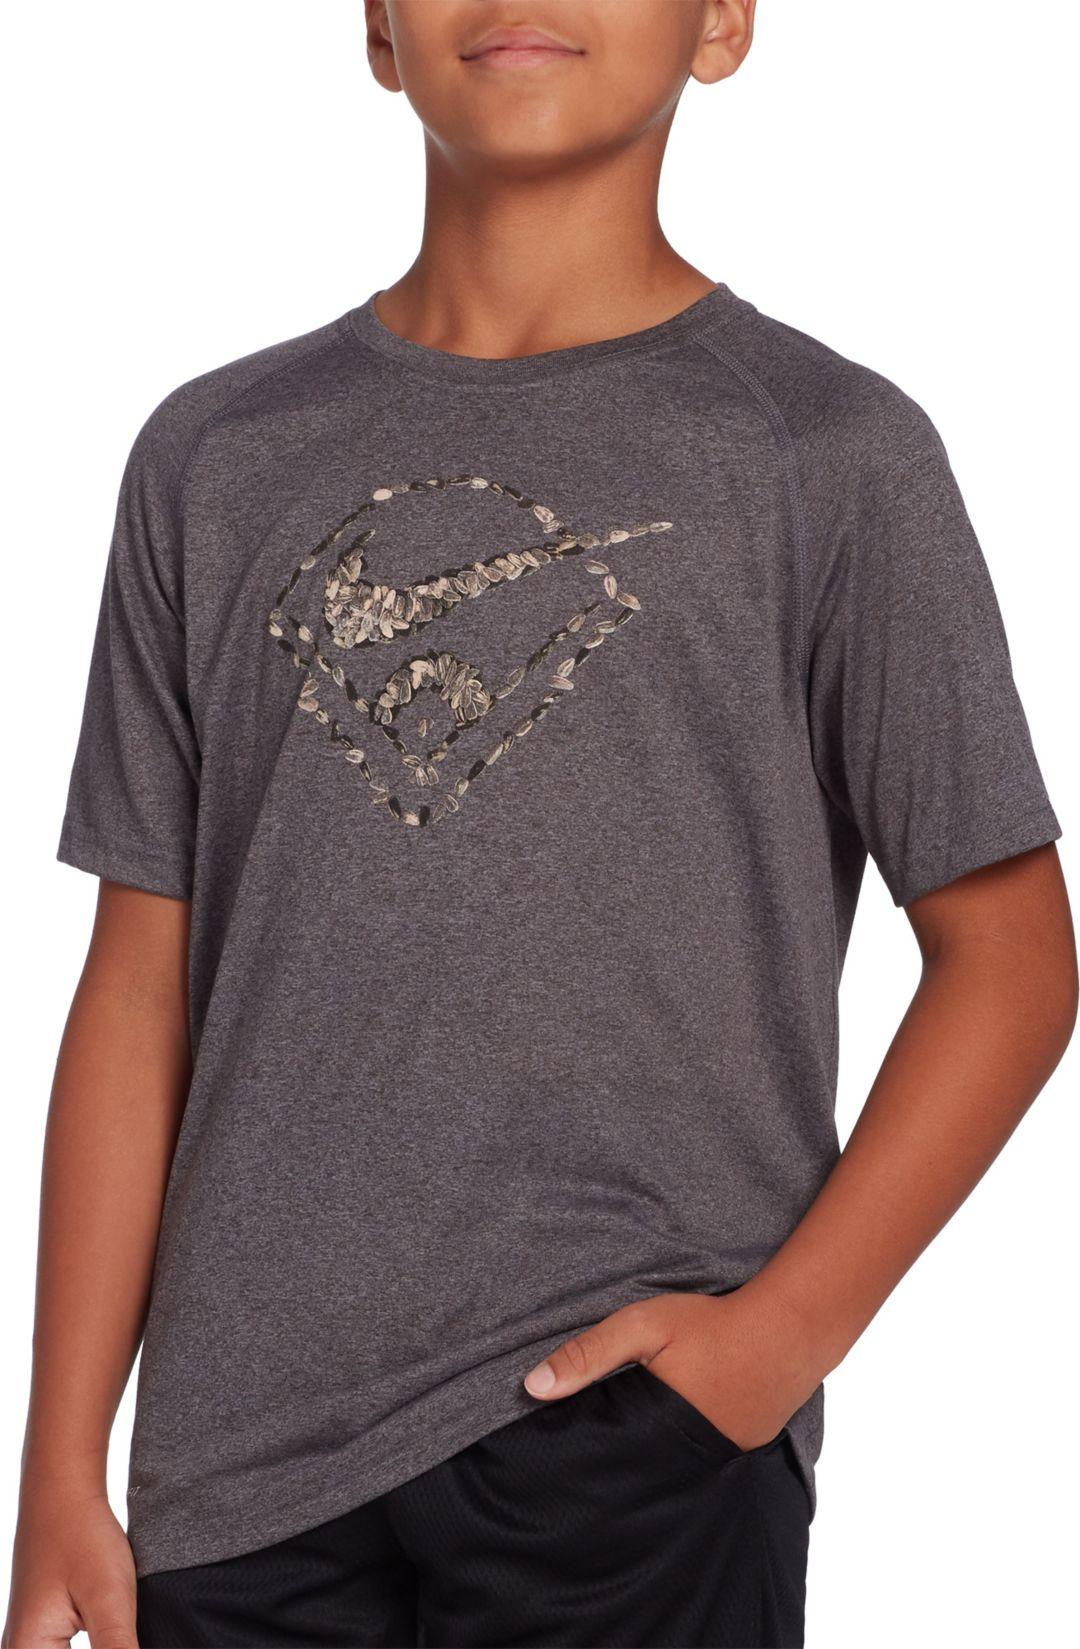 b18a0025 Nike Boys' Dri-FIT Sunflower Seeds Raglan T-Shirt | DICK'S Sporting ...